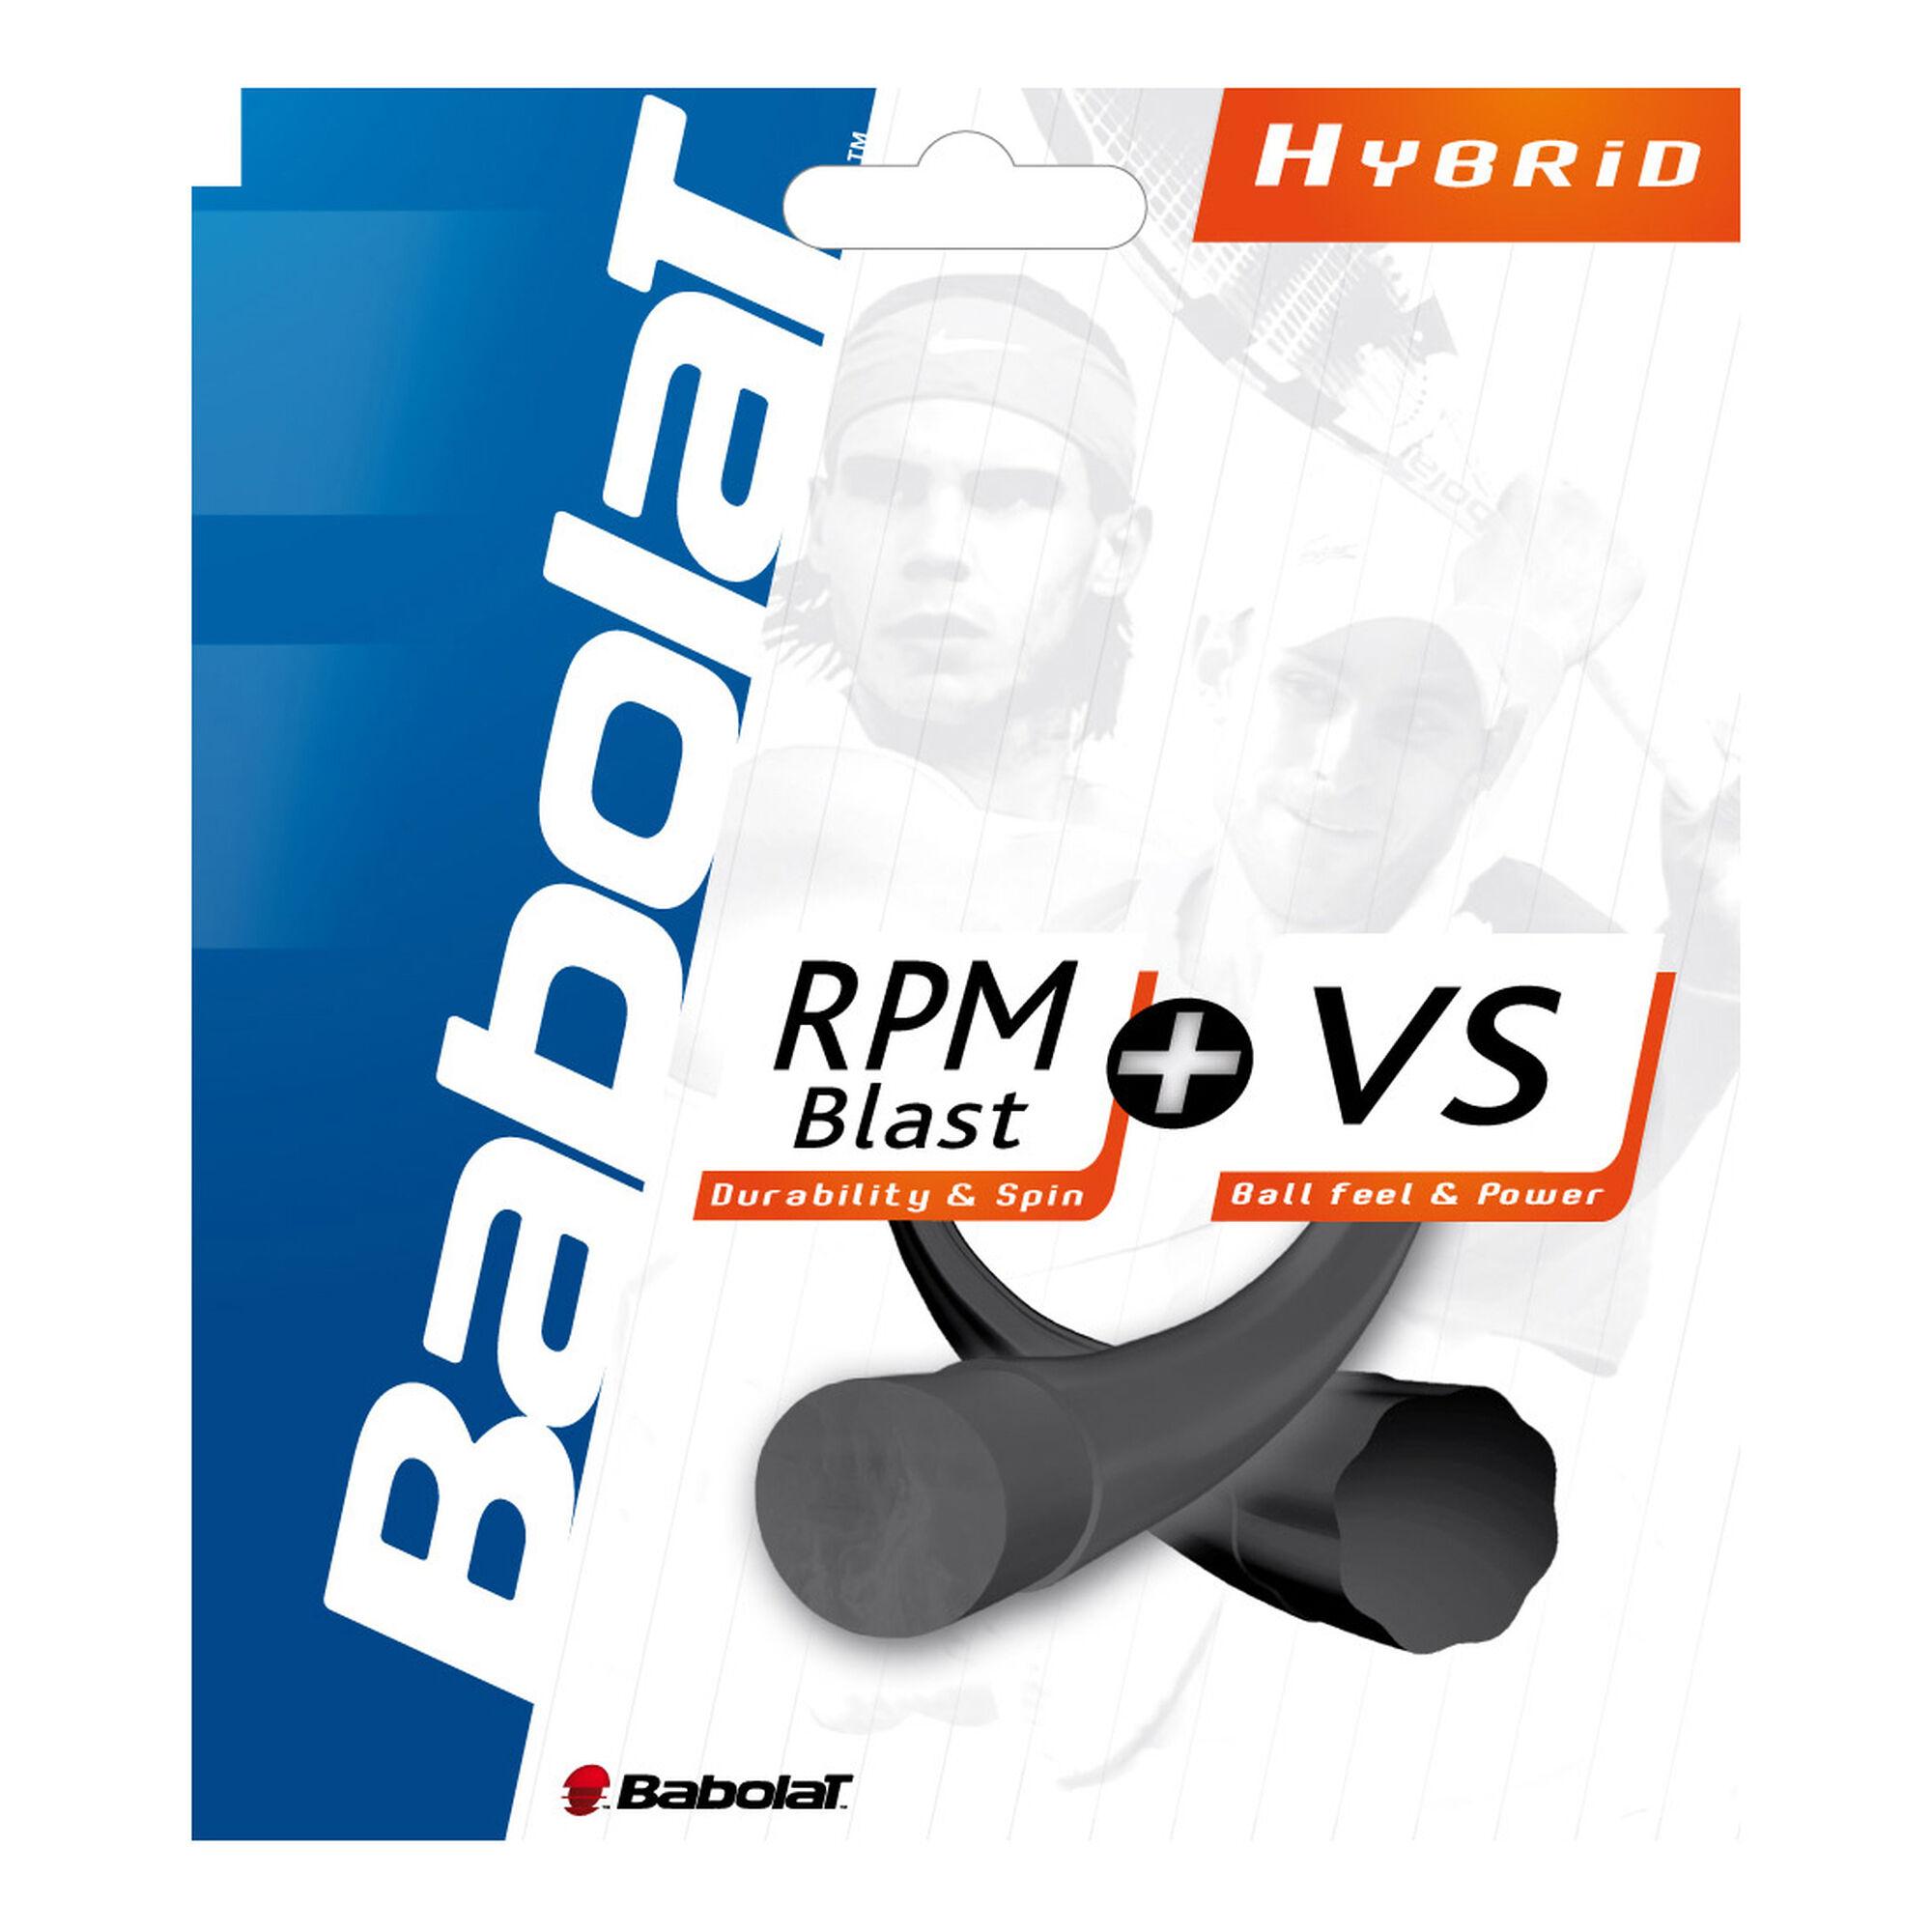 fb7dd18f Babolat RPM Blast + VS Hybridsaite Juego De Cordaje 12m - Negro ...